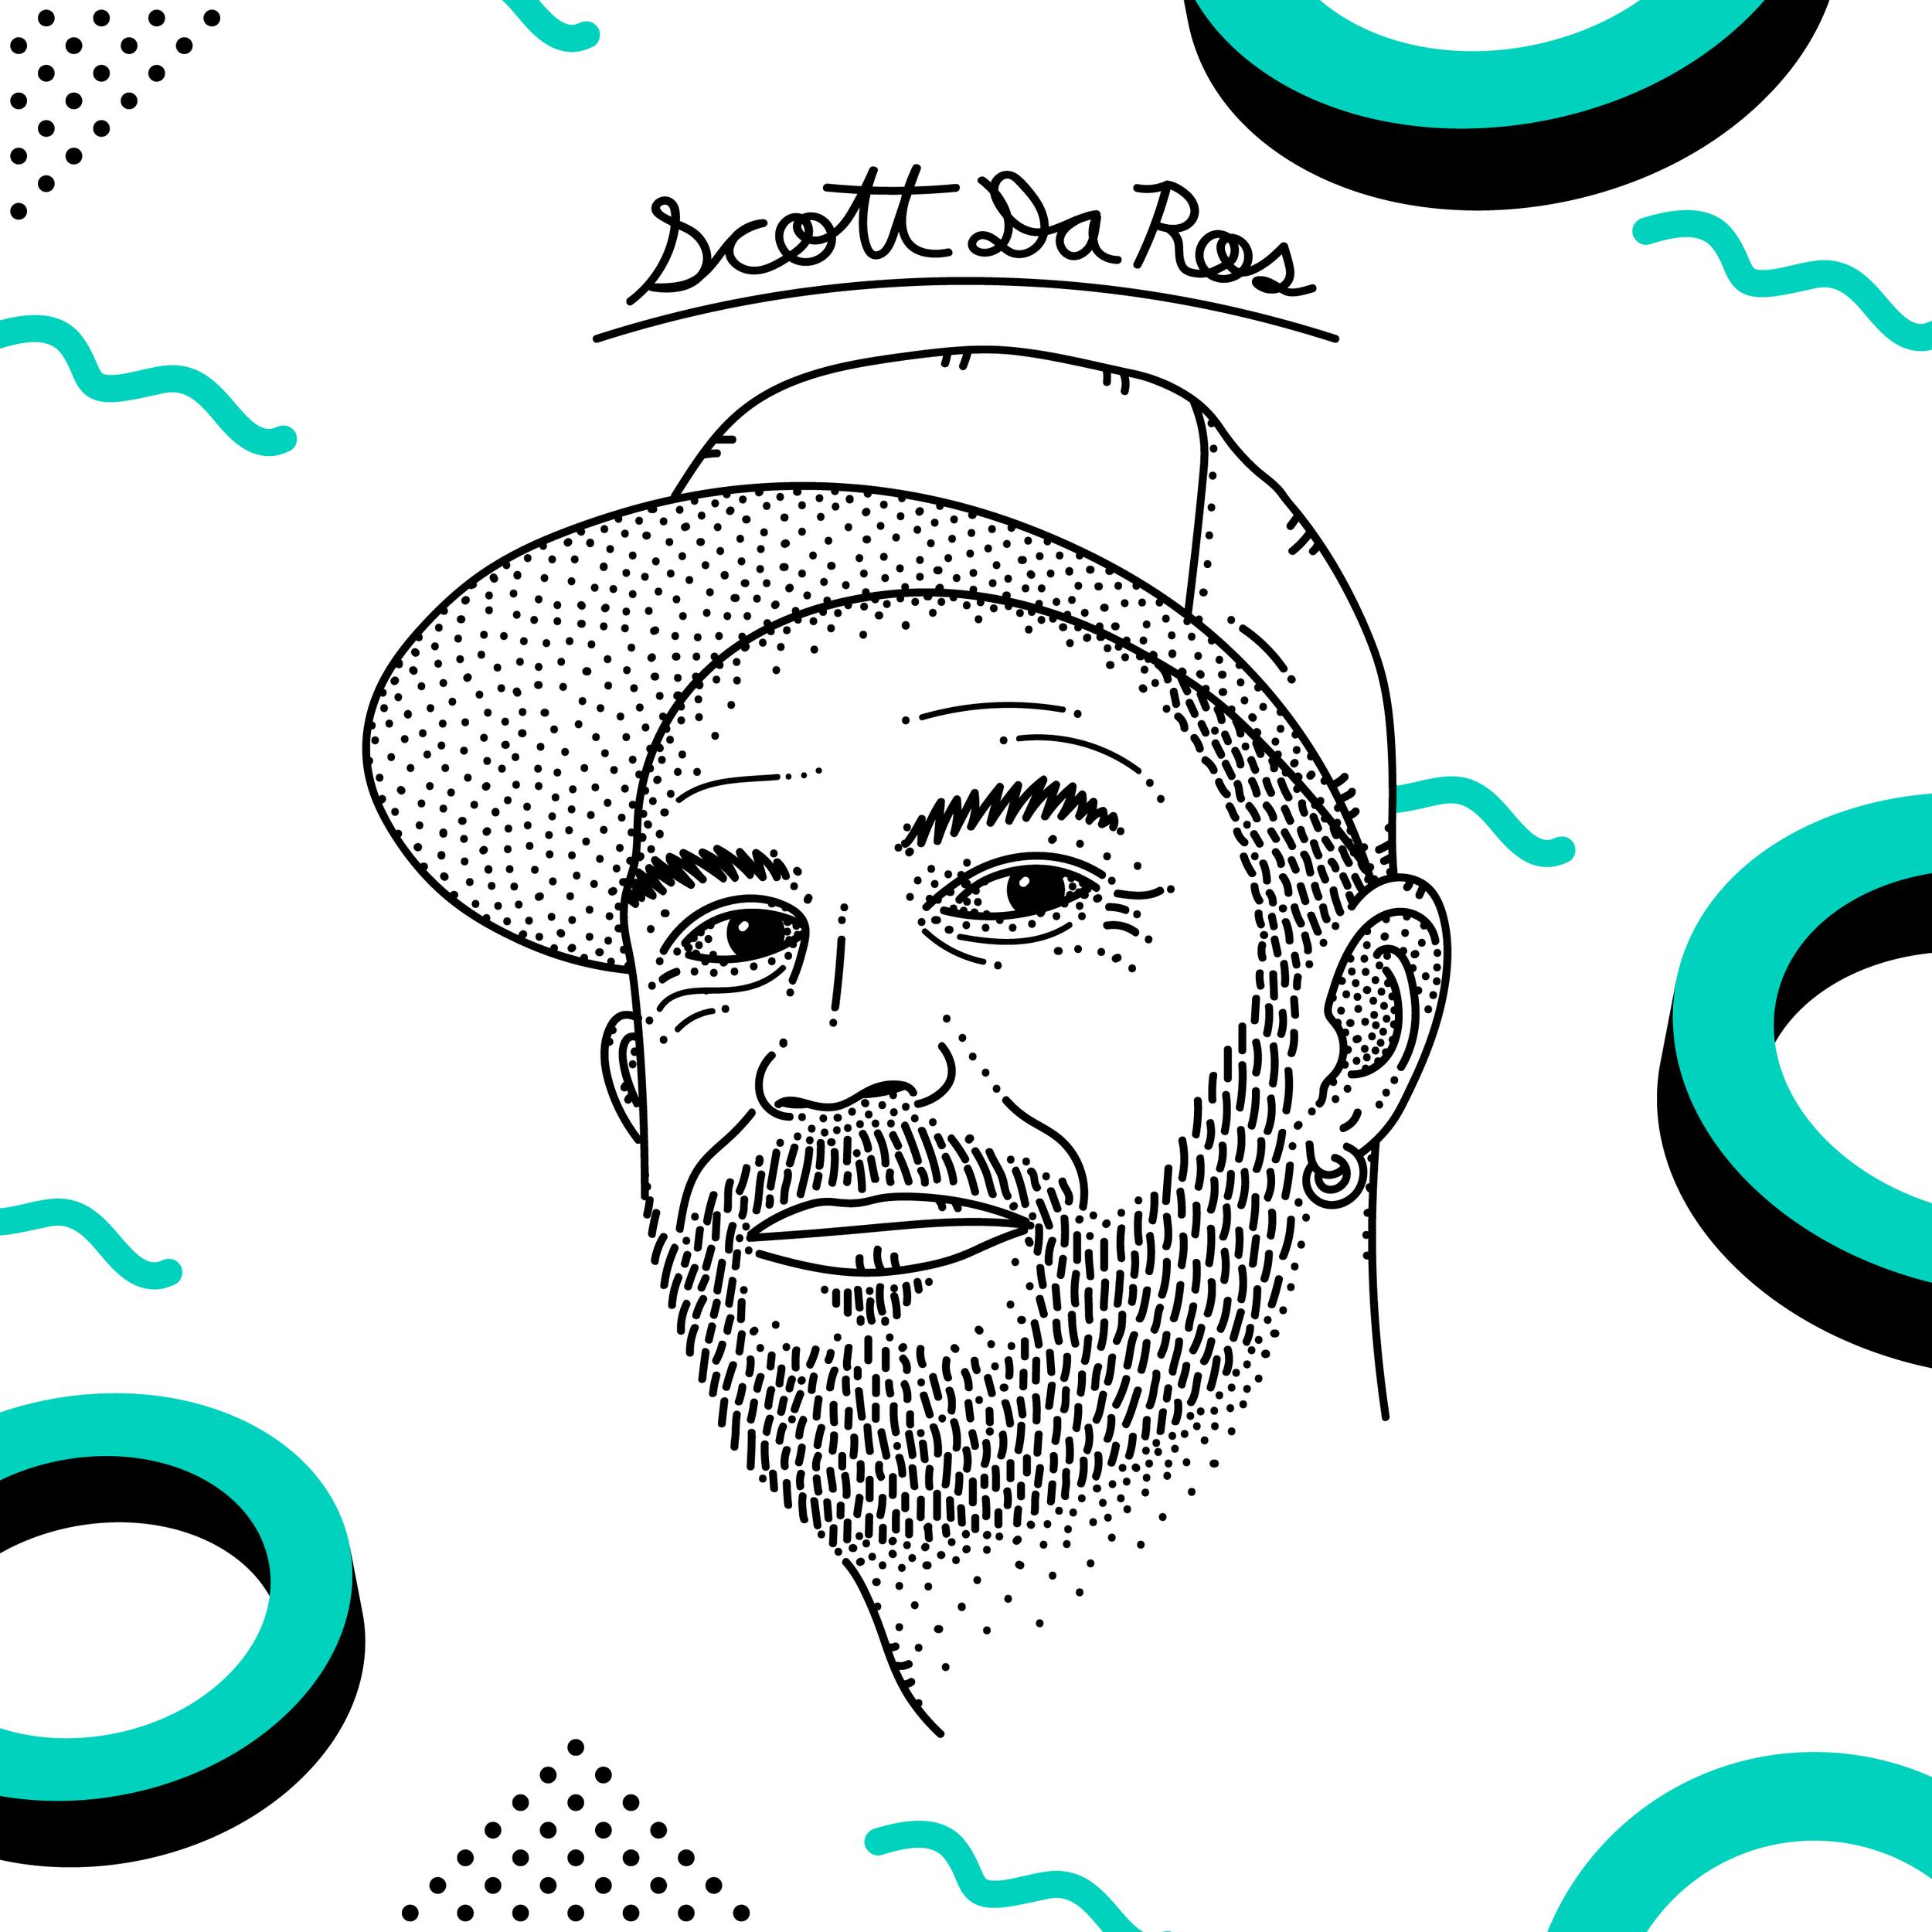 Episode 20 - Scott Da Ros - Endemik Records